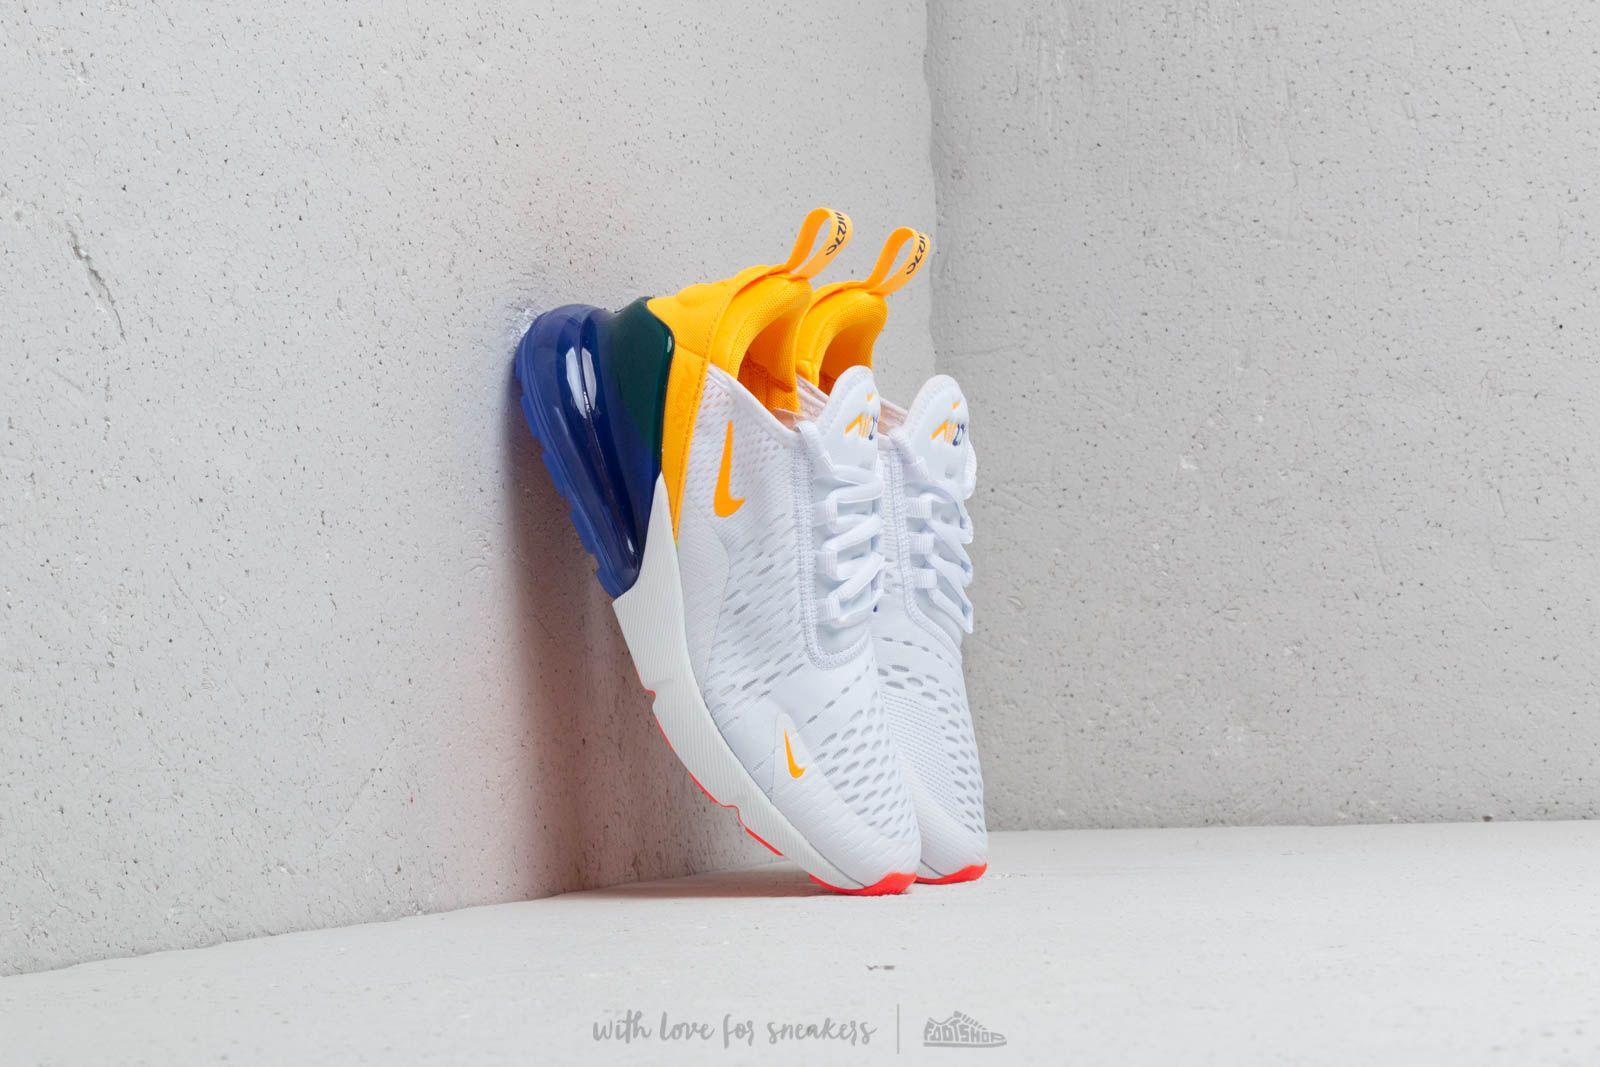 nike air max 270 white orange